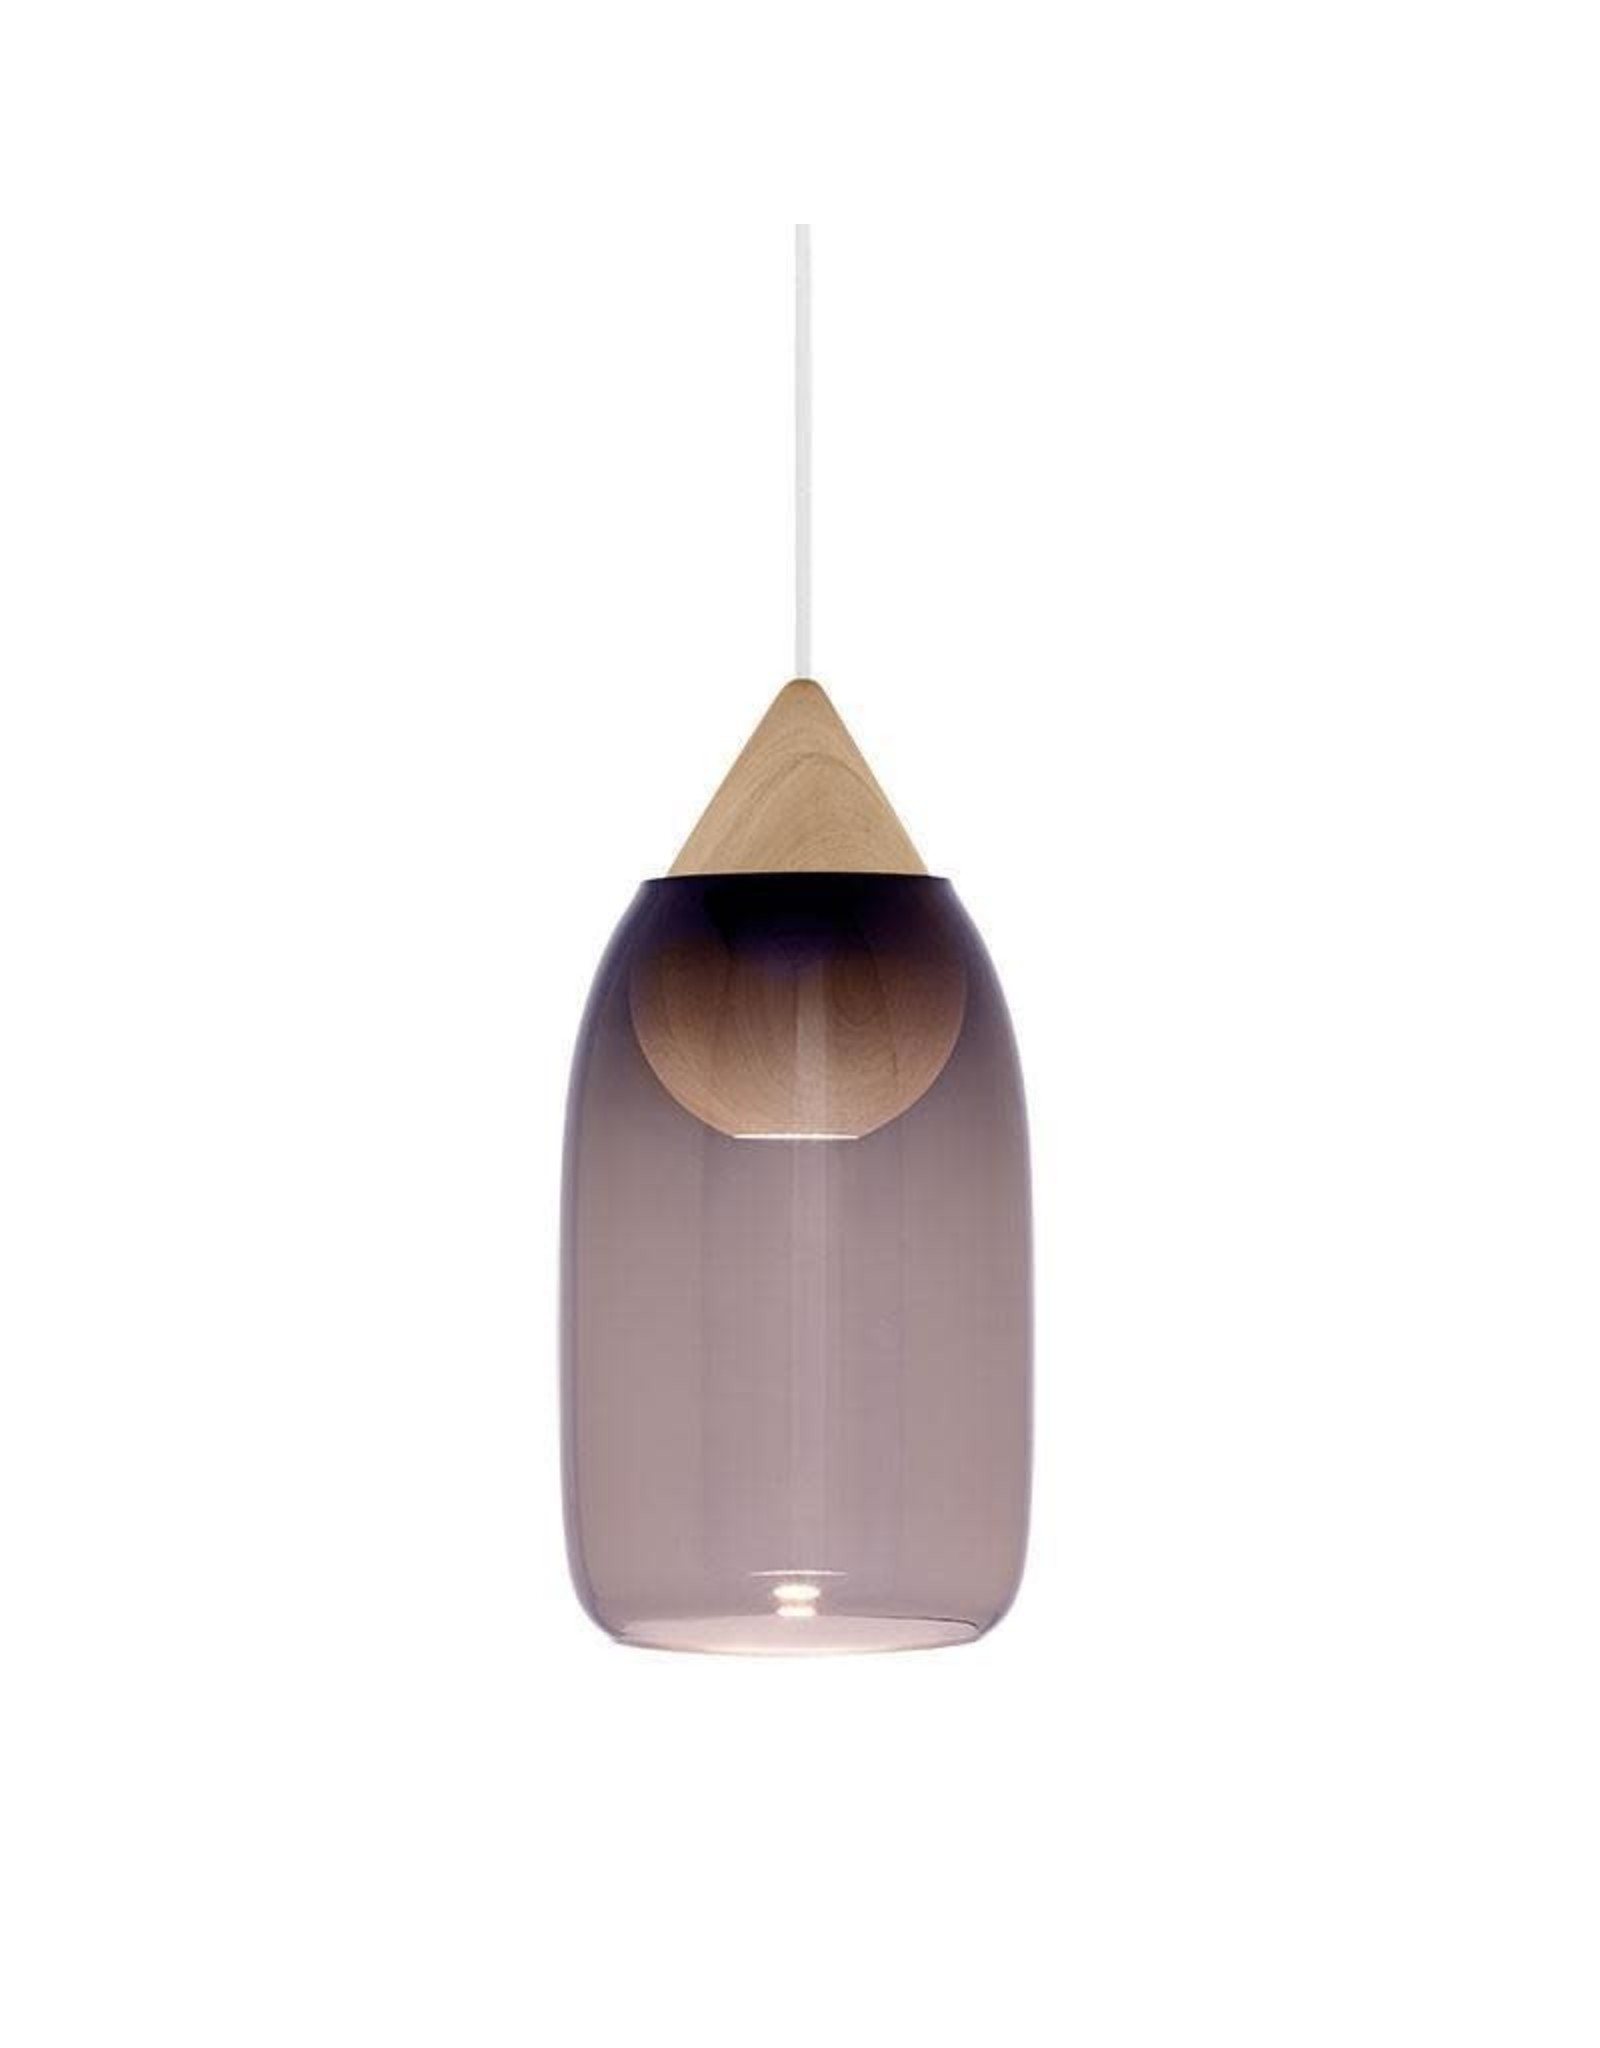 LIUKU 水滴形橡木配燈罩吊燈